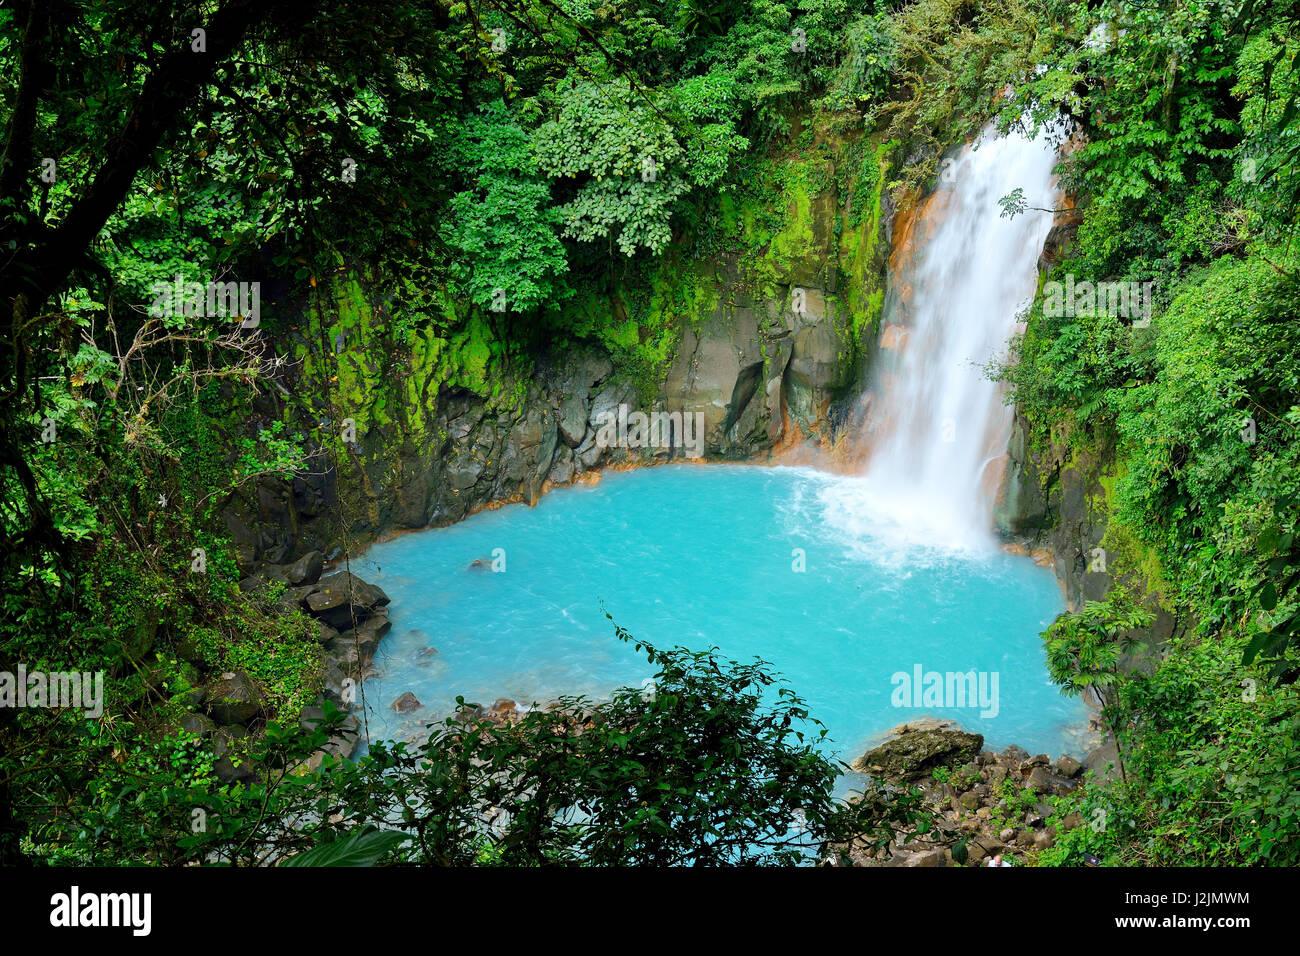 Cascada con las azules aguas del Río Celeste en el Parque Nacional Volcán Tenorio, Costa Rica, Centroamérica Foto de stock